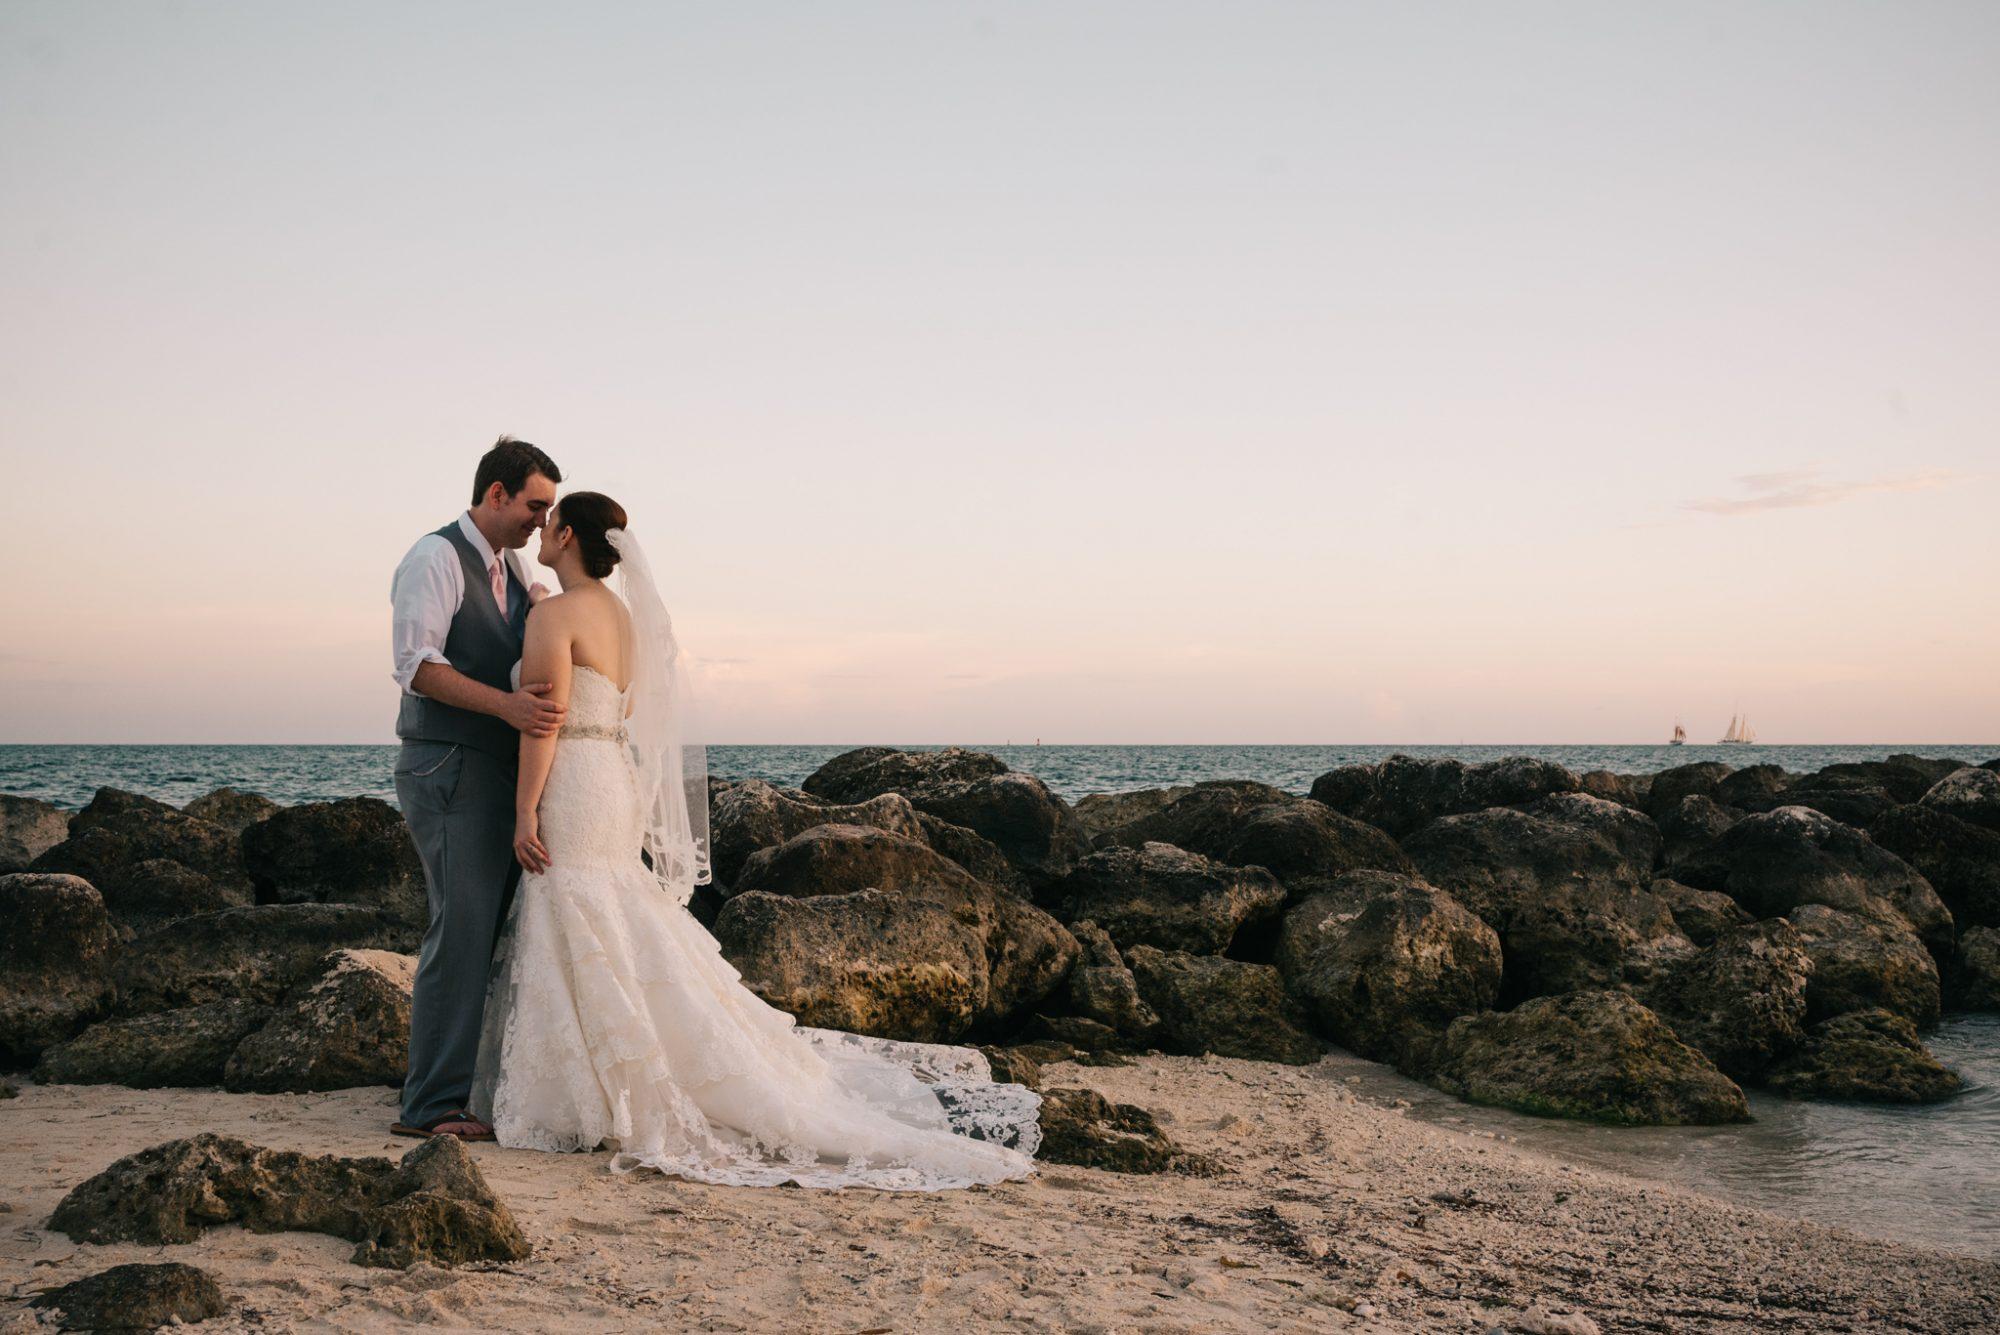 Heather Jeff Key West Wedding Photographer Fort Zachary Taylor 32 - Heather & Jeff - Key West Wedding Photographer - Fort Zachary Taylor